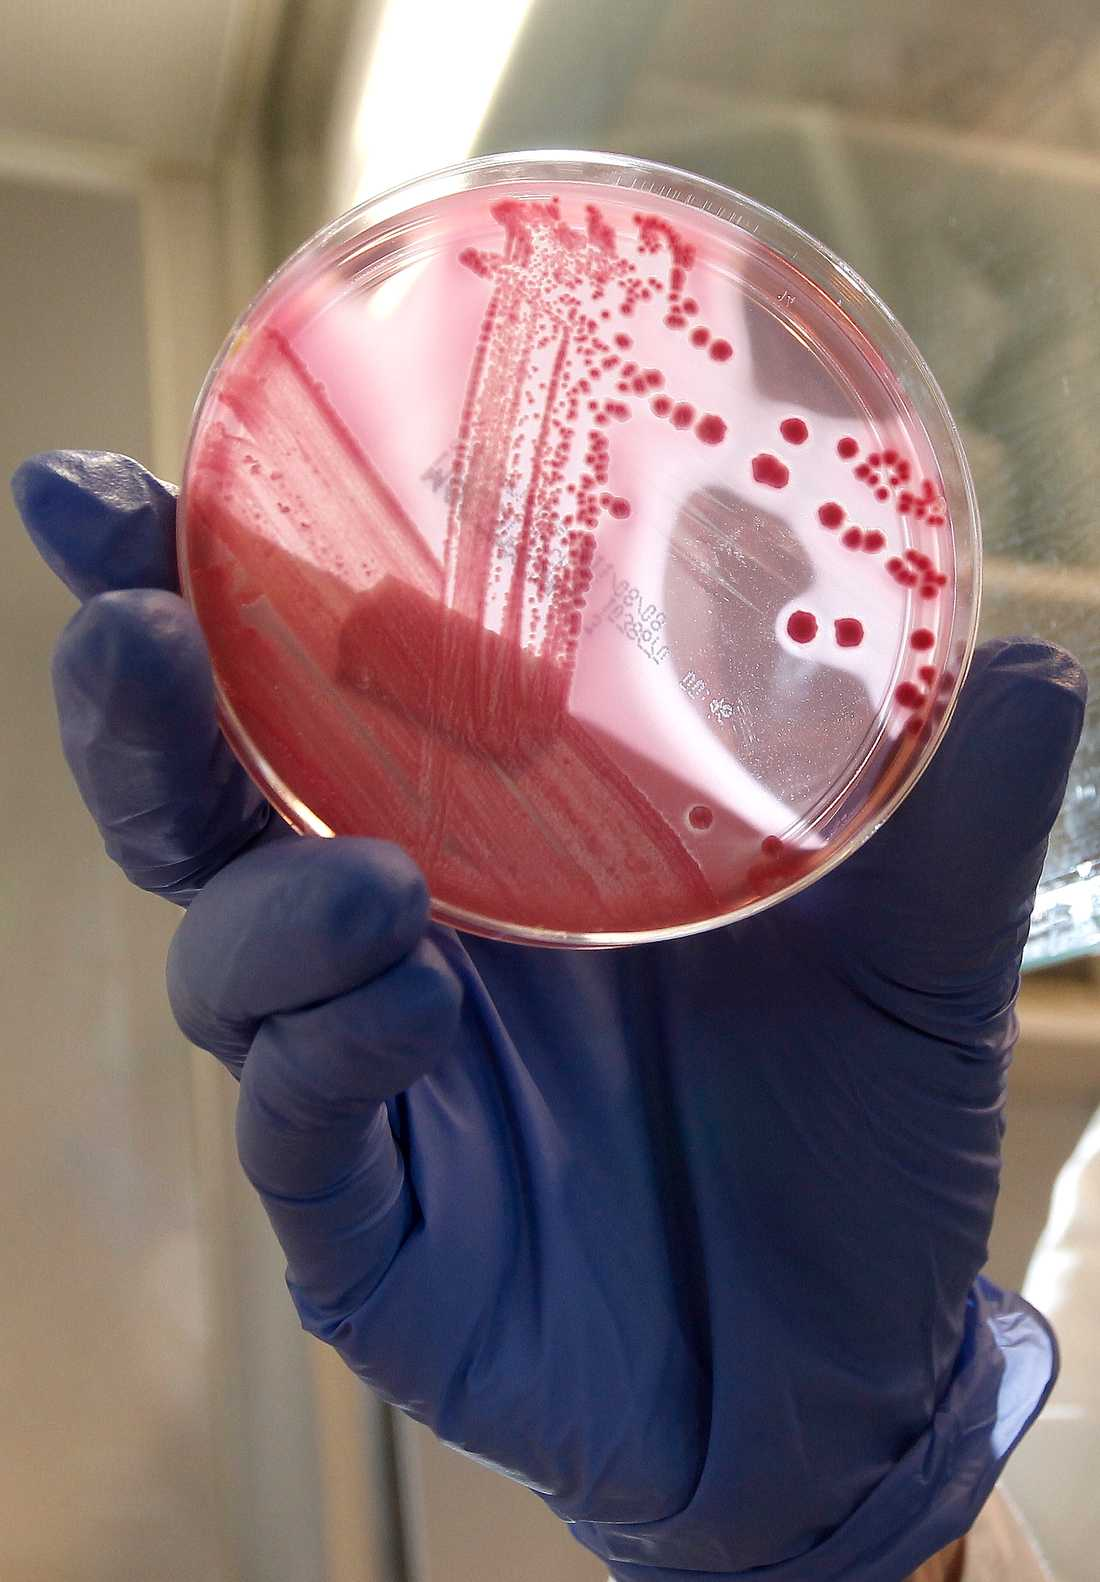 Bakterieodling med EHEC i ett laboratorium.